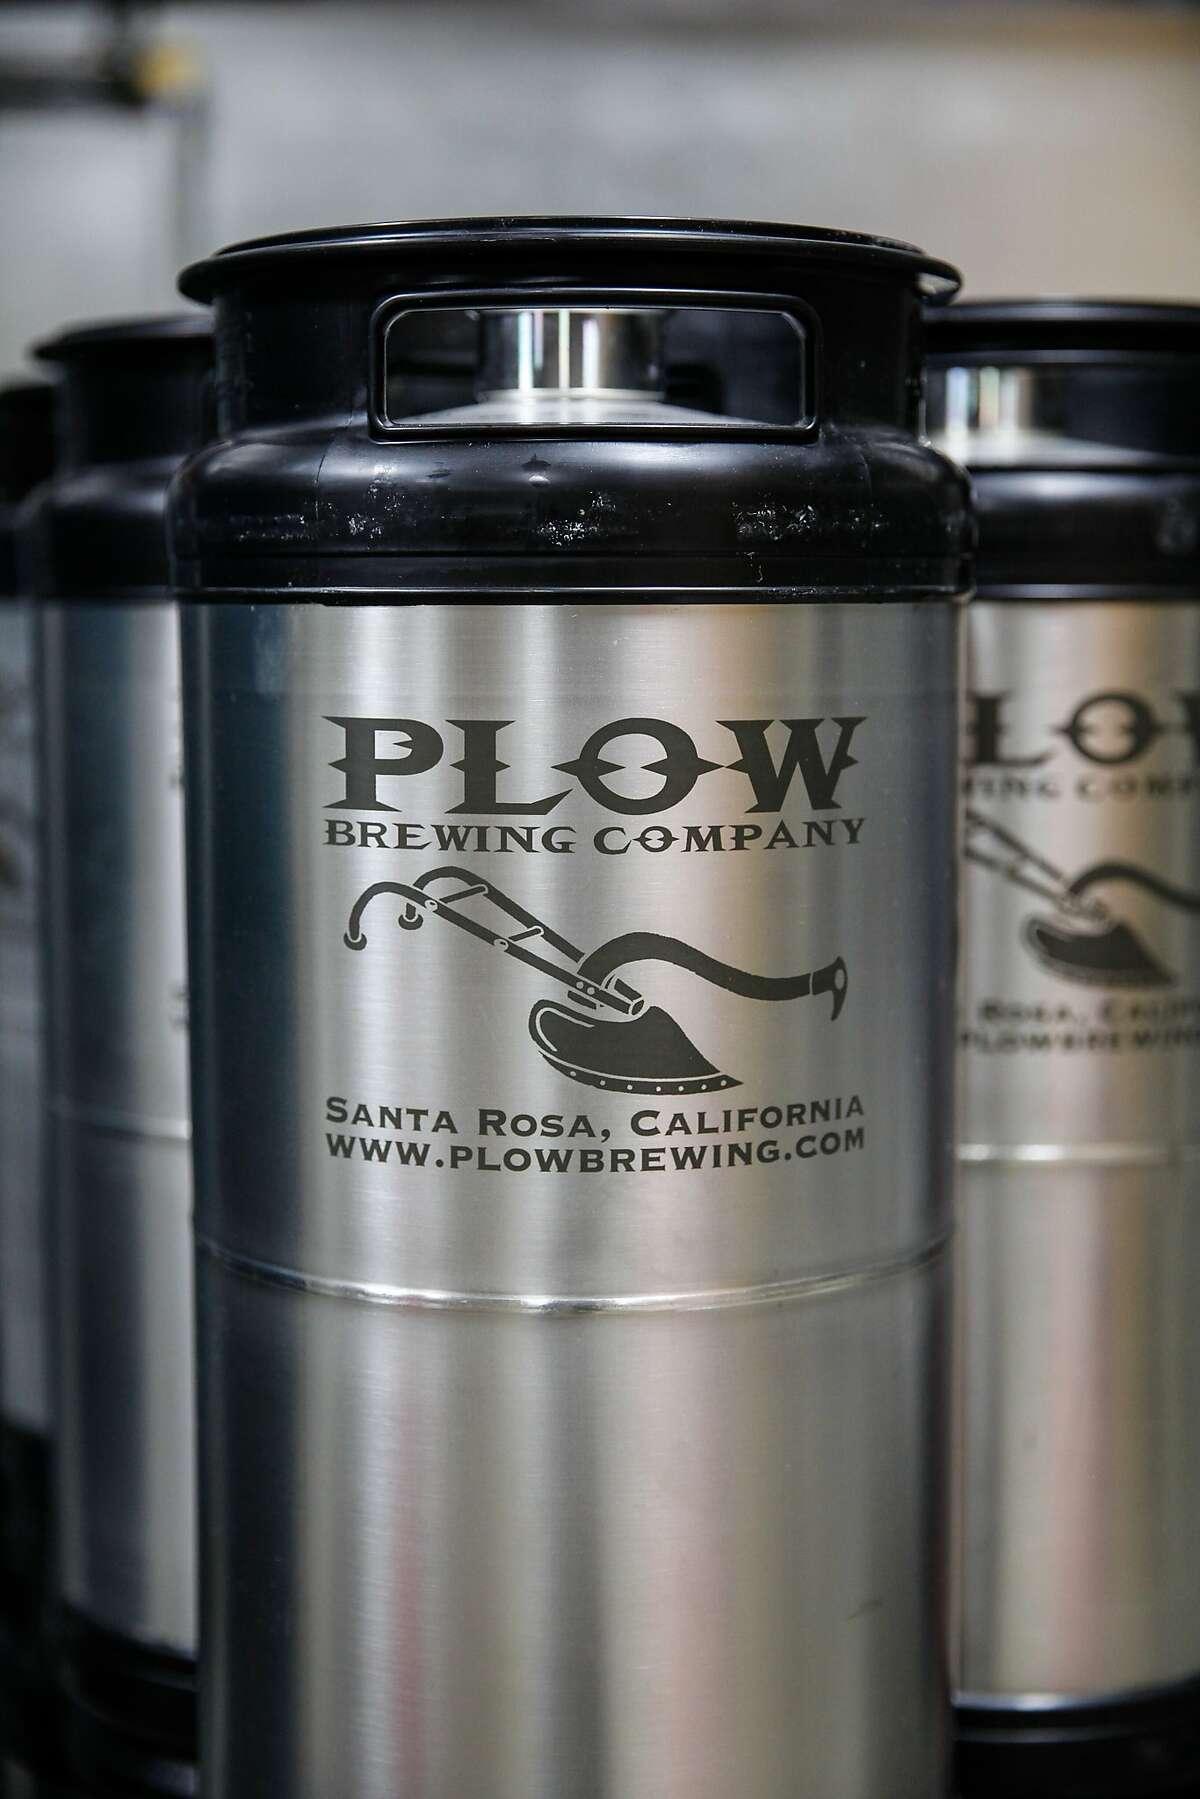 Beer brewed at Plow in Santa Rosa, Calif., on Wednesday, October 21, 2015.